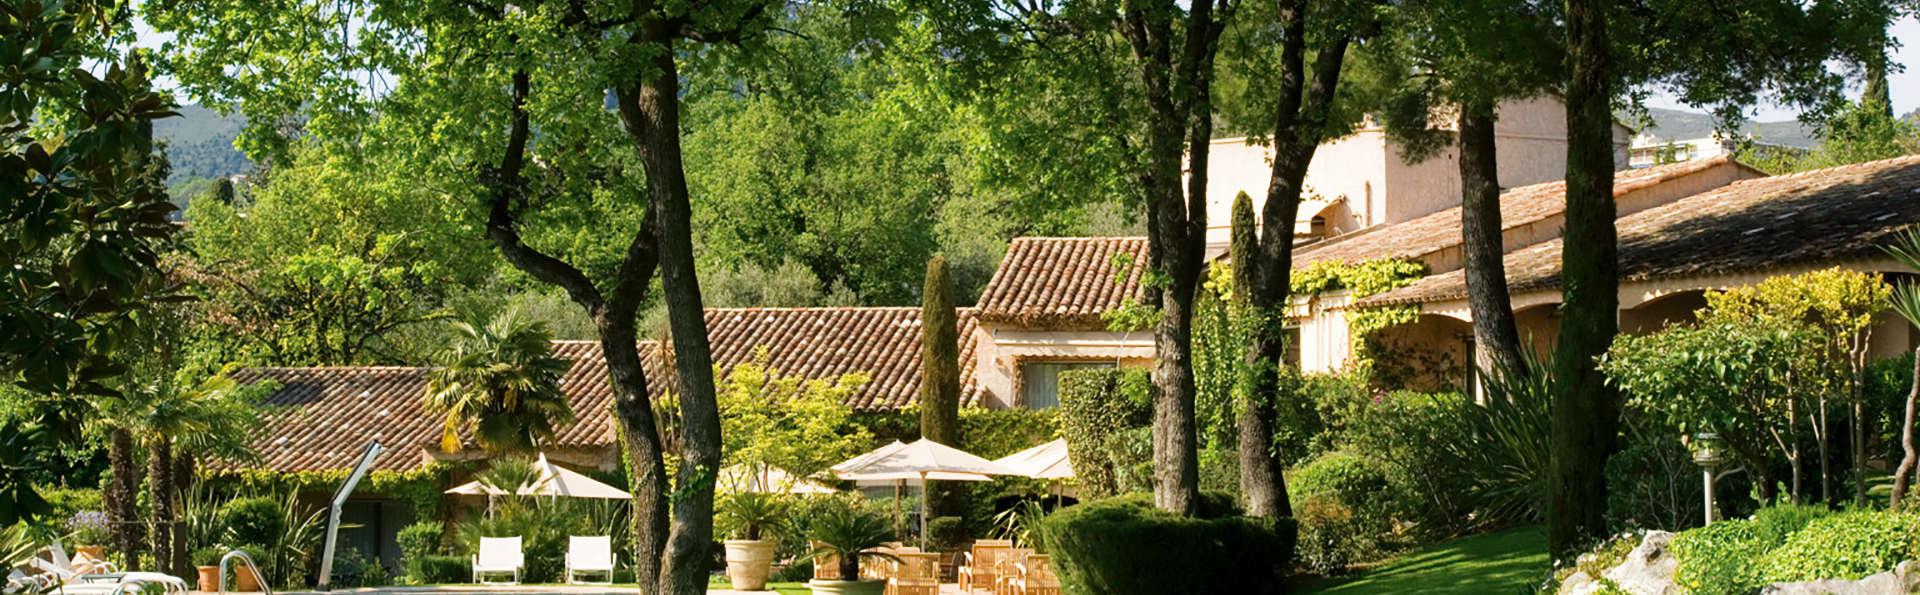 Hôtel Cantemerle Spa et Restaurant - EDIT_Jardin_1.jpg